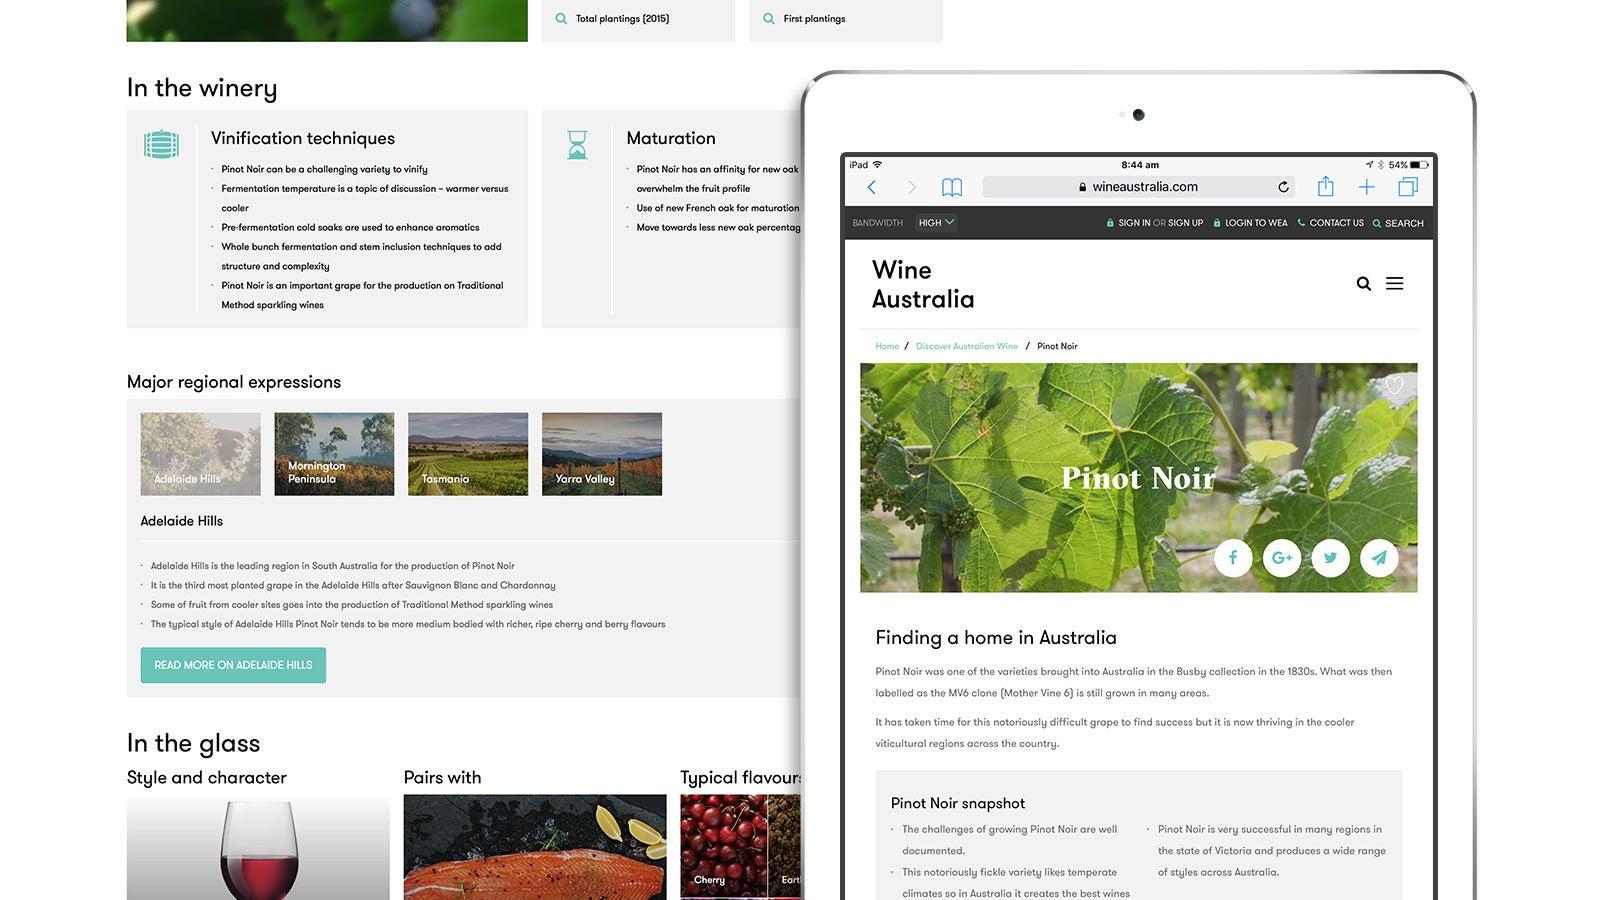 Wine Australia   Pino Noir information page shown on an iPad   Devotion